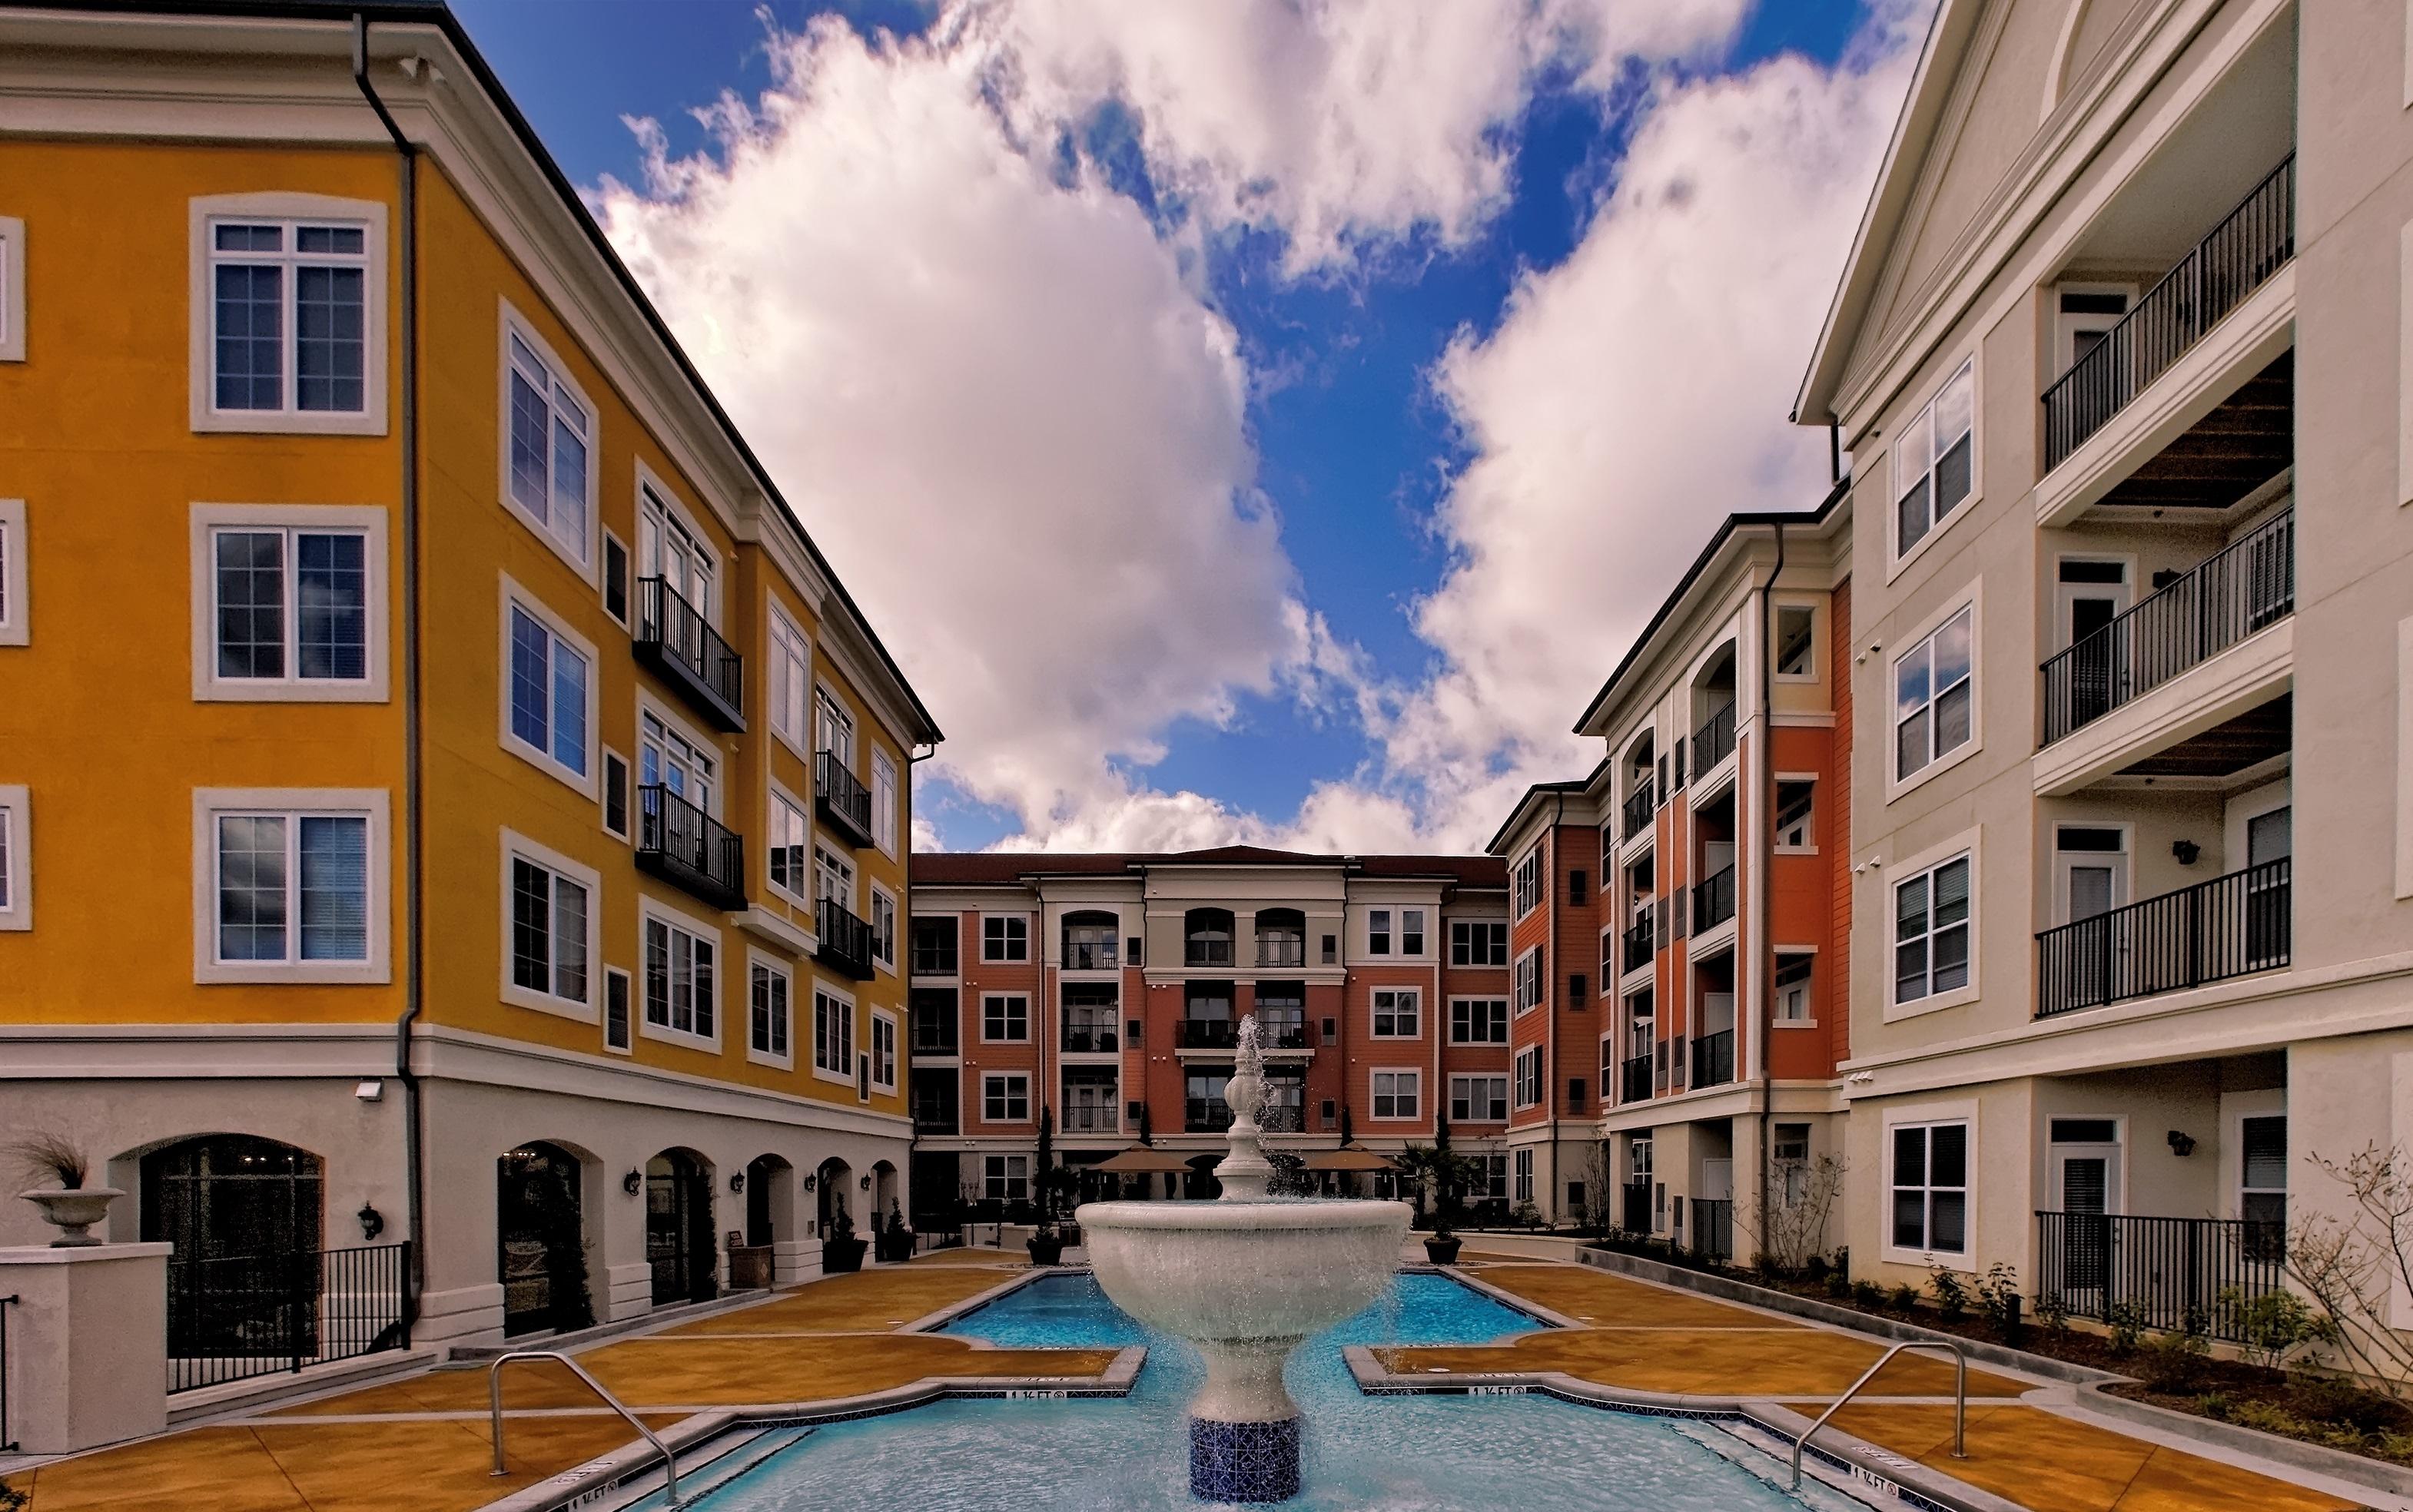 Fayetteville photogallery 3